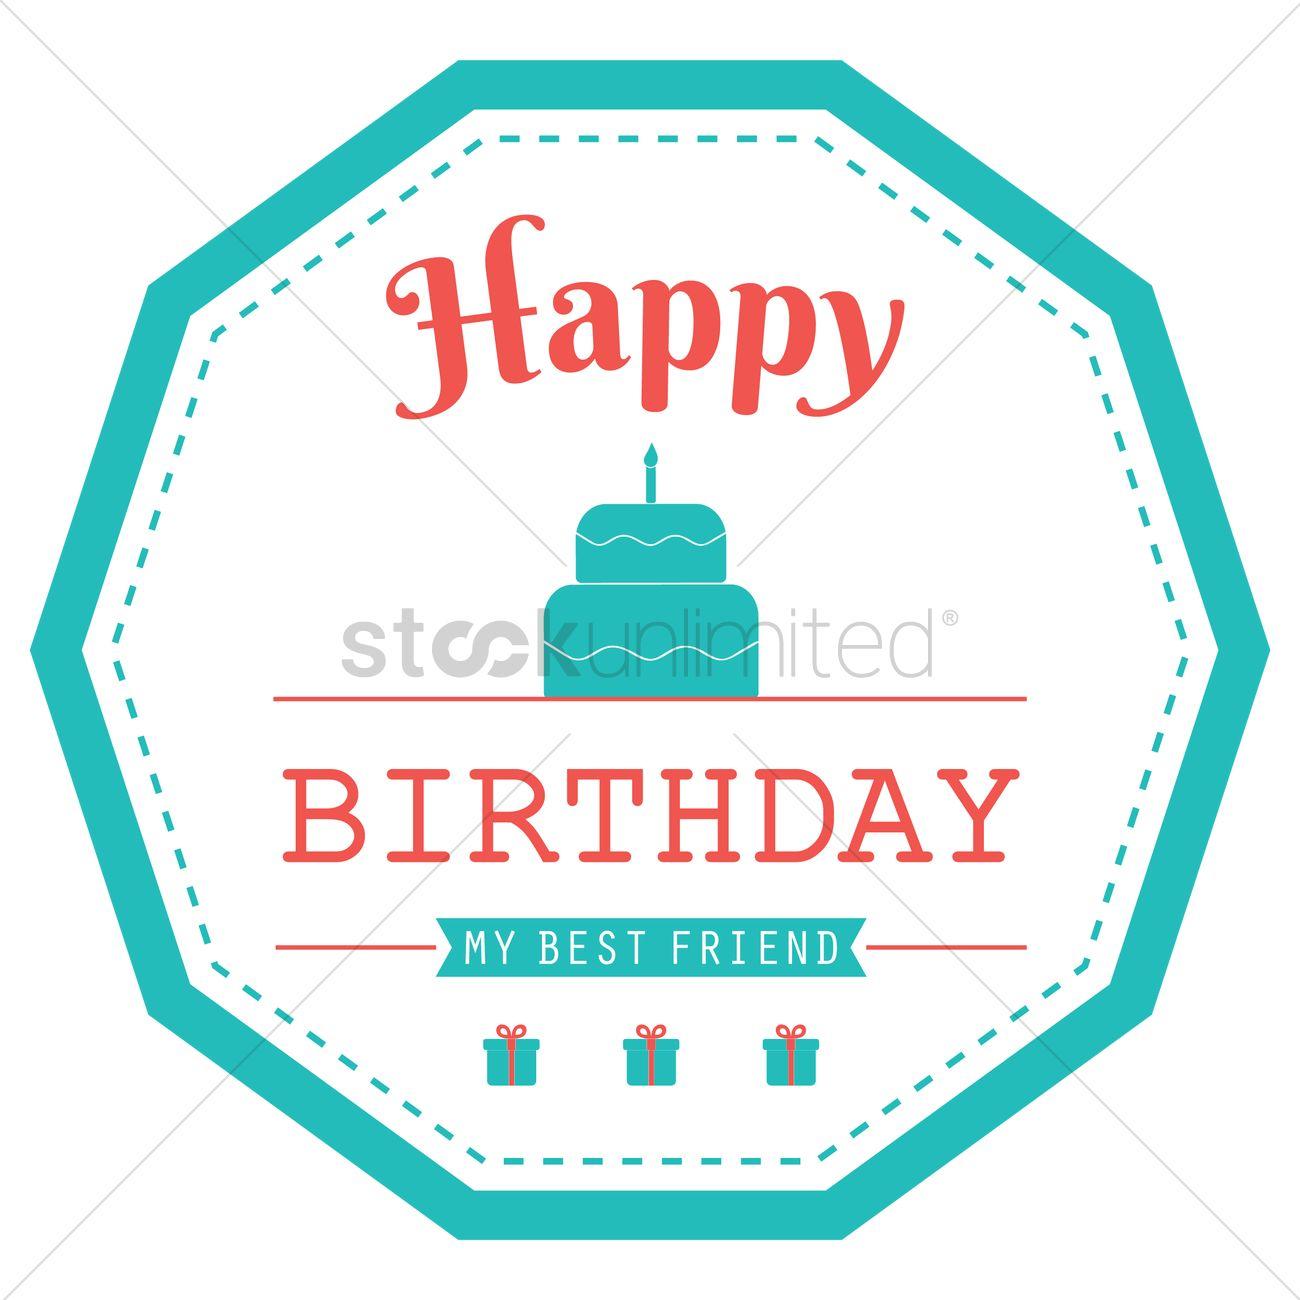 happy birthday label design vector image 1799572 stockunlimited